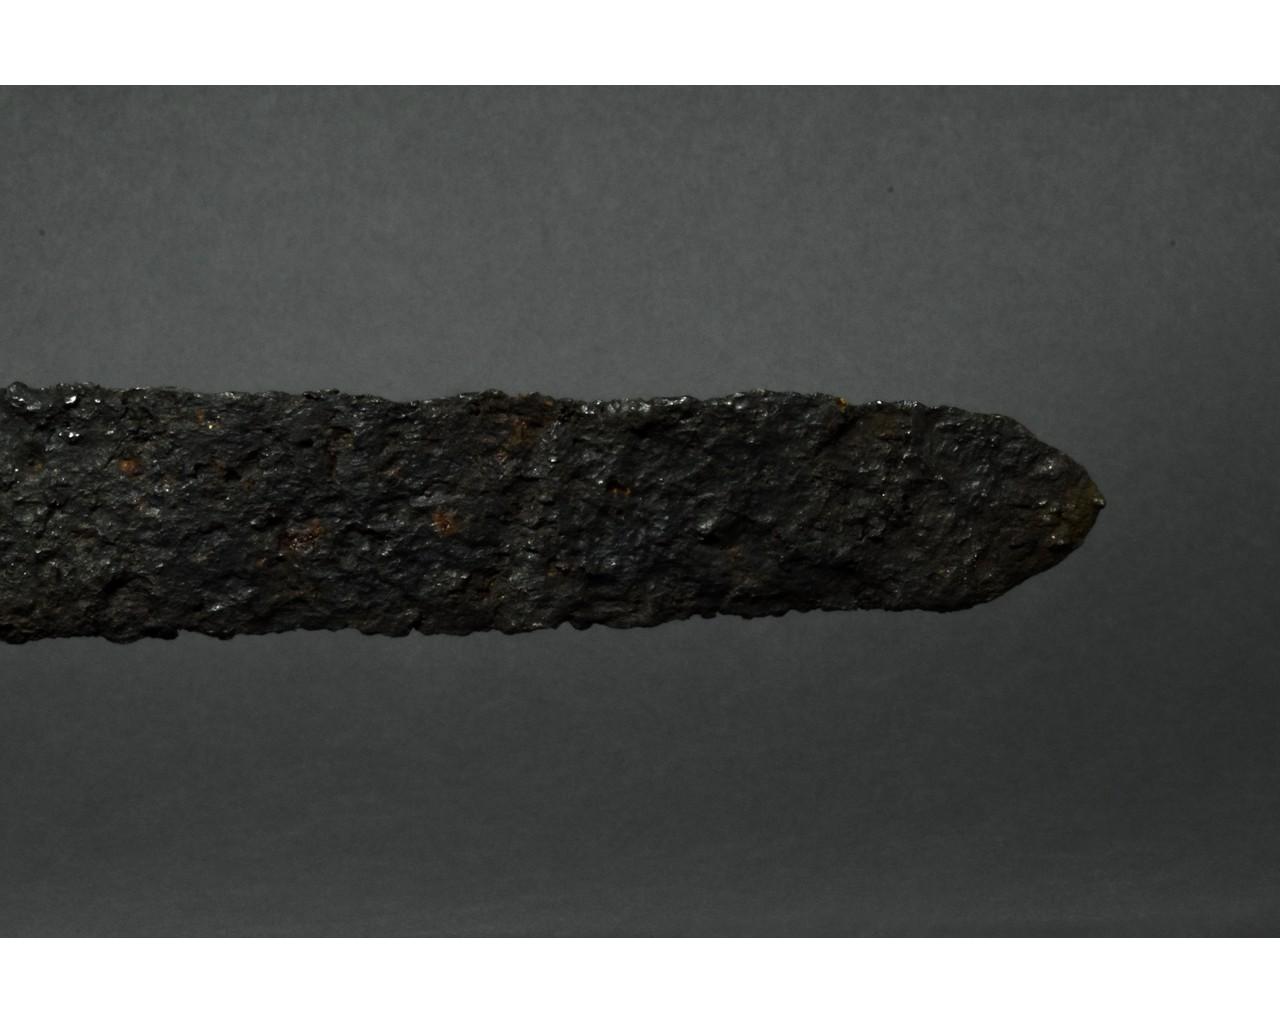 LATE ROMAN IRON SPATHA SWORD - Image 7 of 7